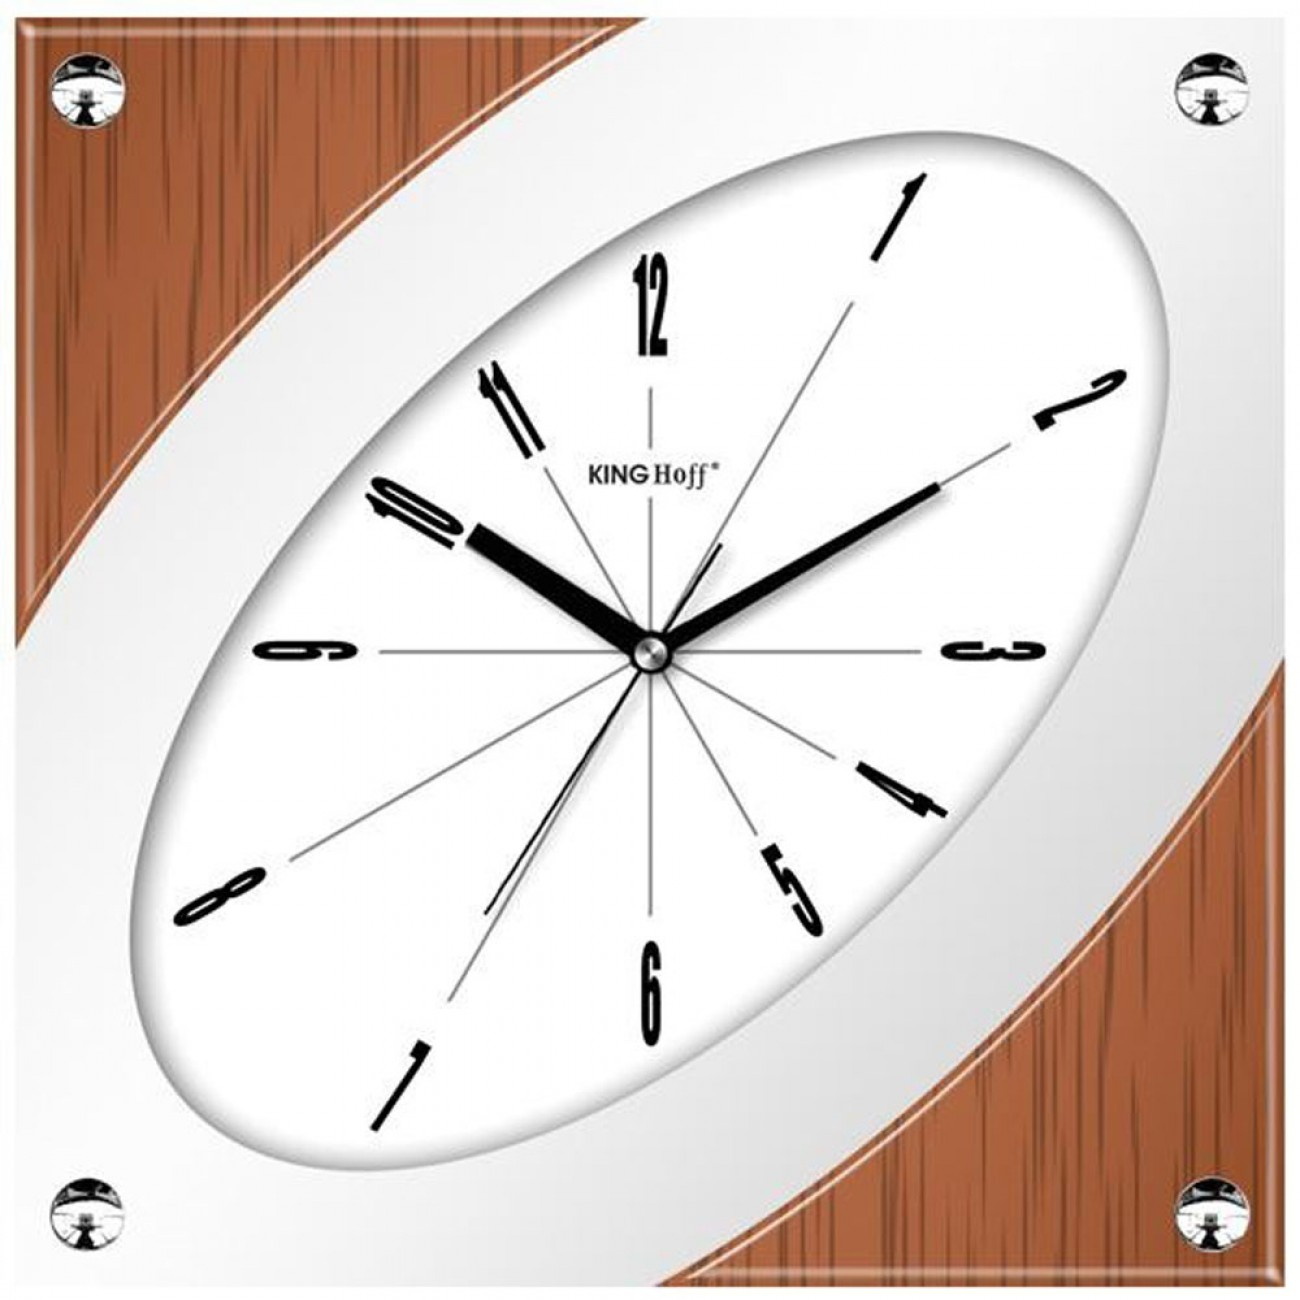 Стенен часовник KingHoff KH 5020, 32 см, Аналогов, Кафяв/бял в Стенни часовници - Kinghoff | Alleop